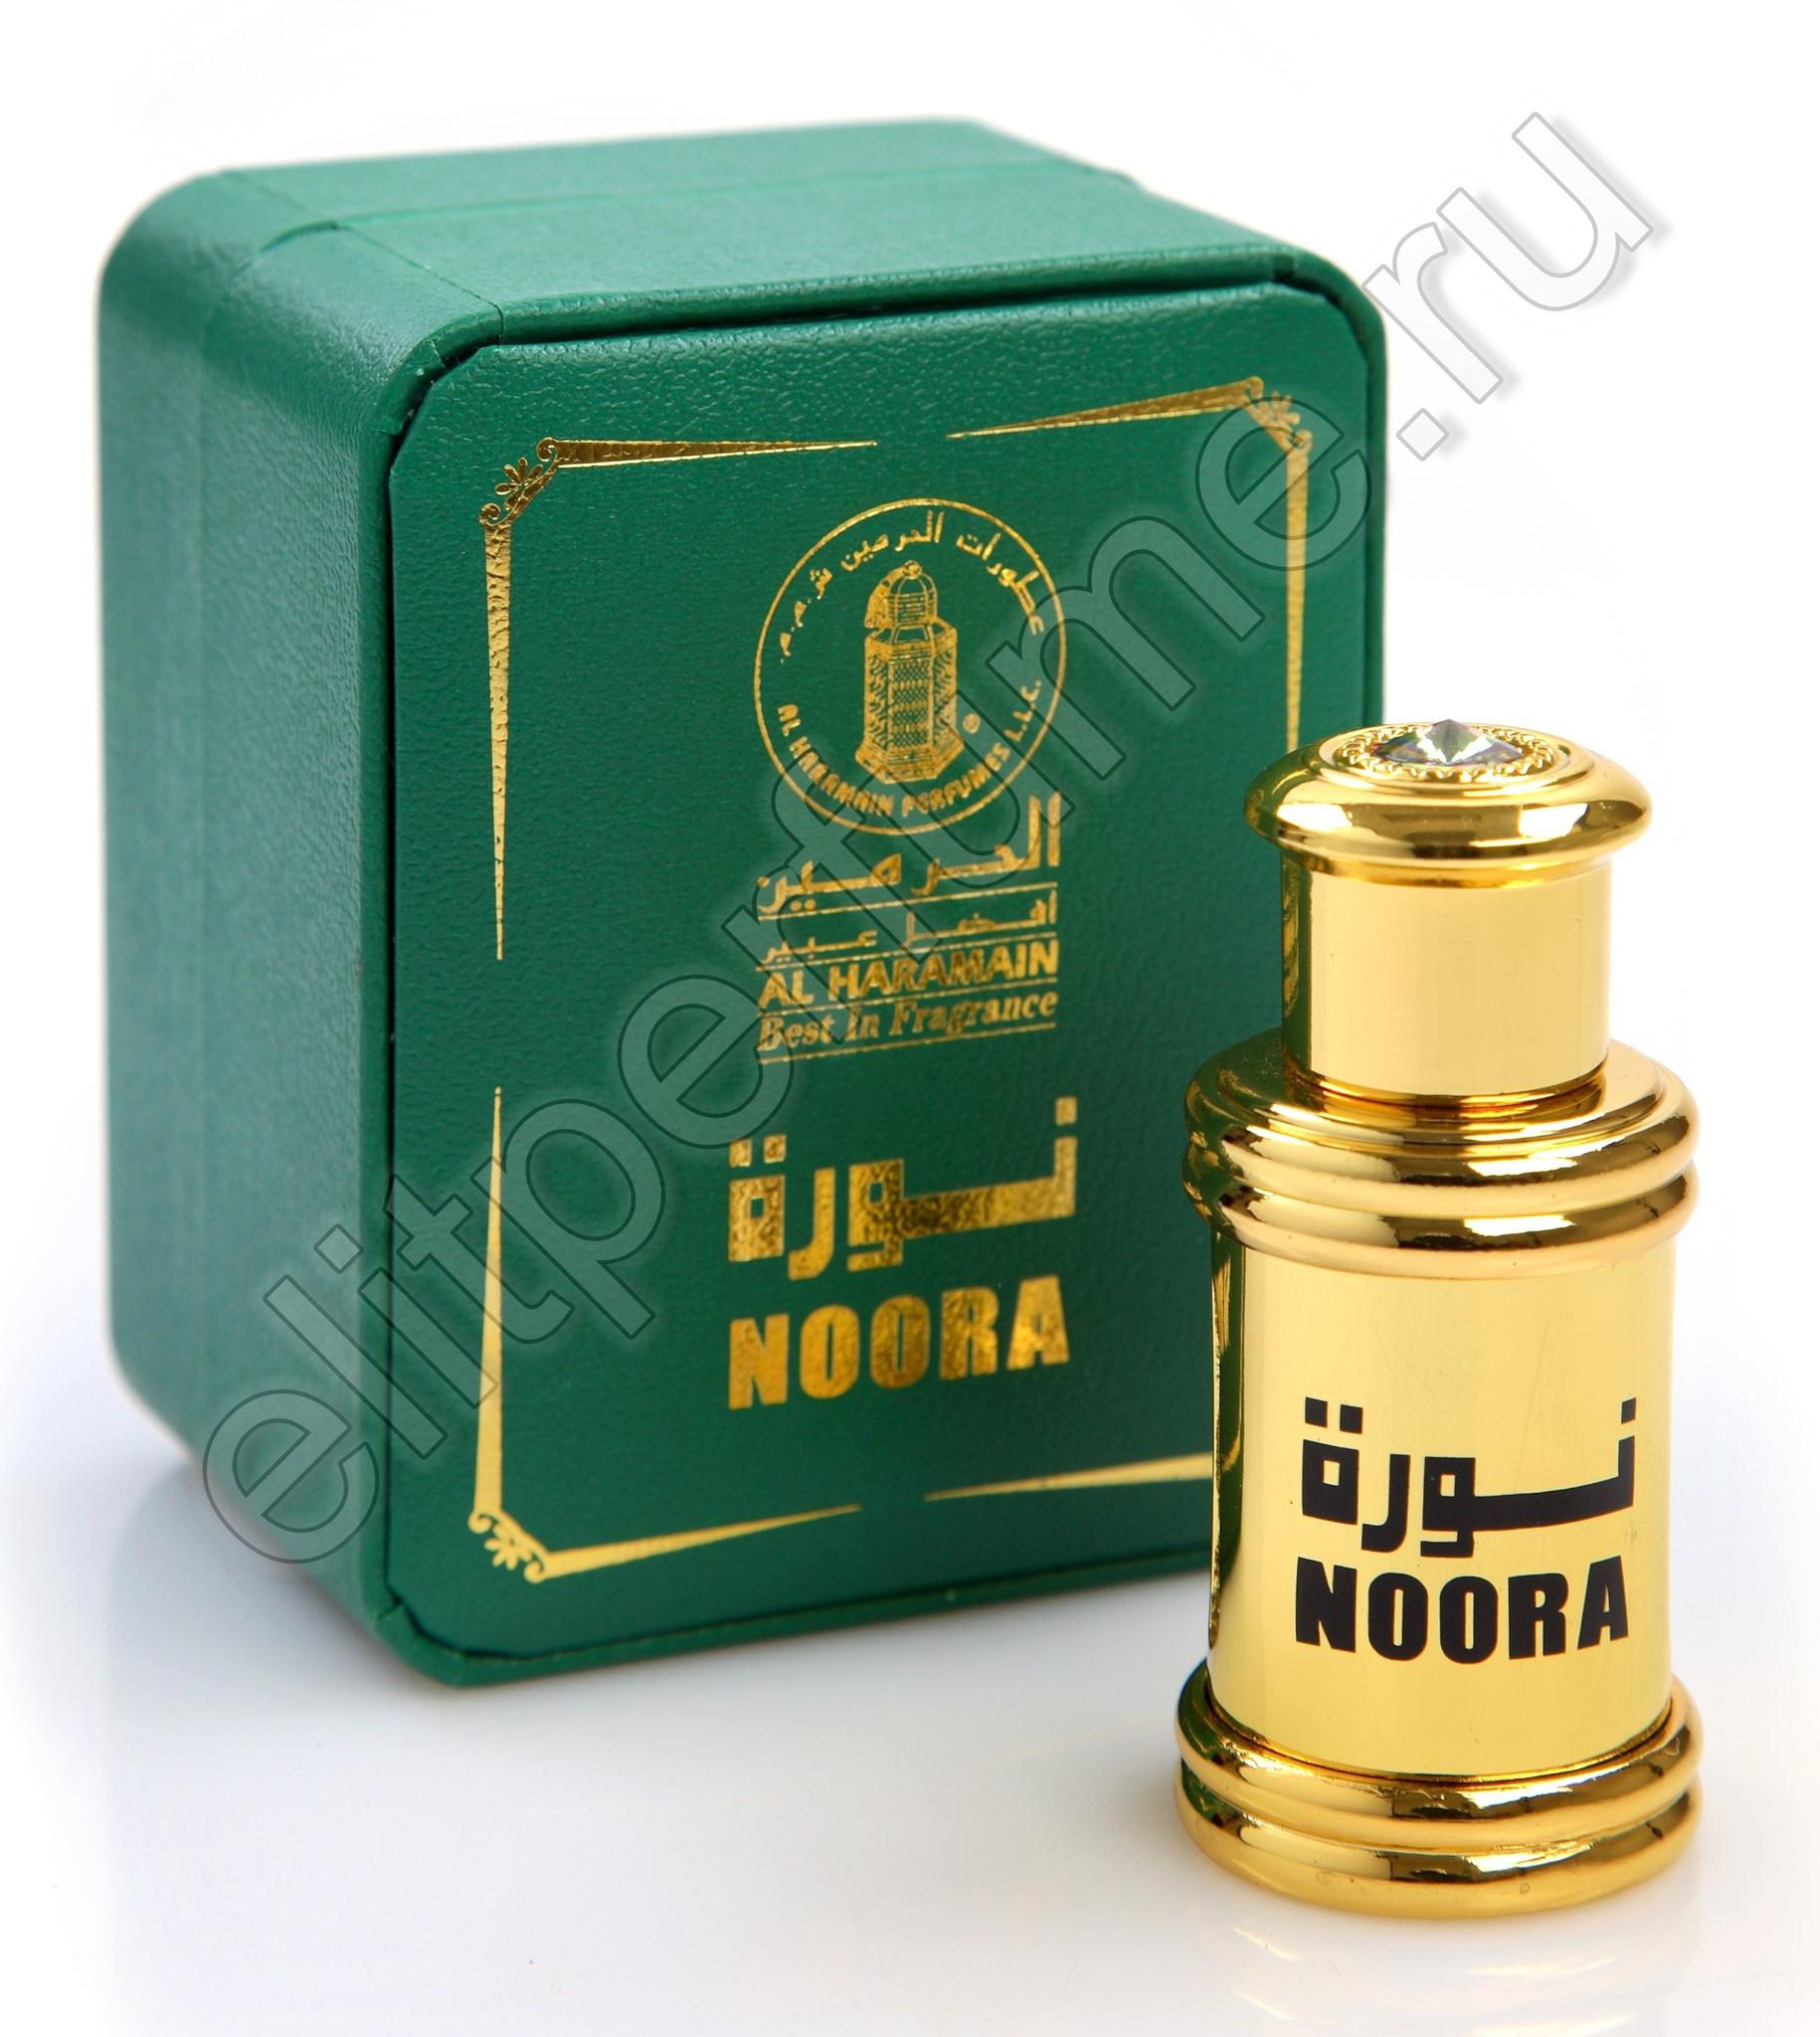 Нура Noora 12 мл арабские масляные духи от Аль Харамайн Al Haramain Perfumes